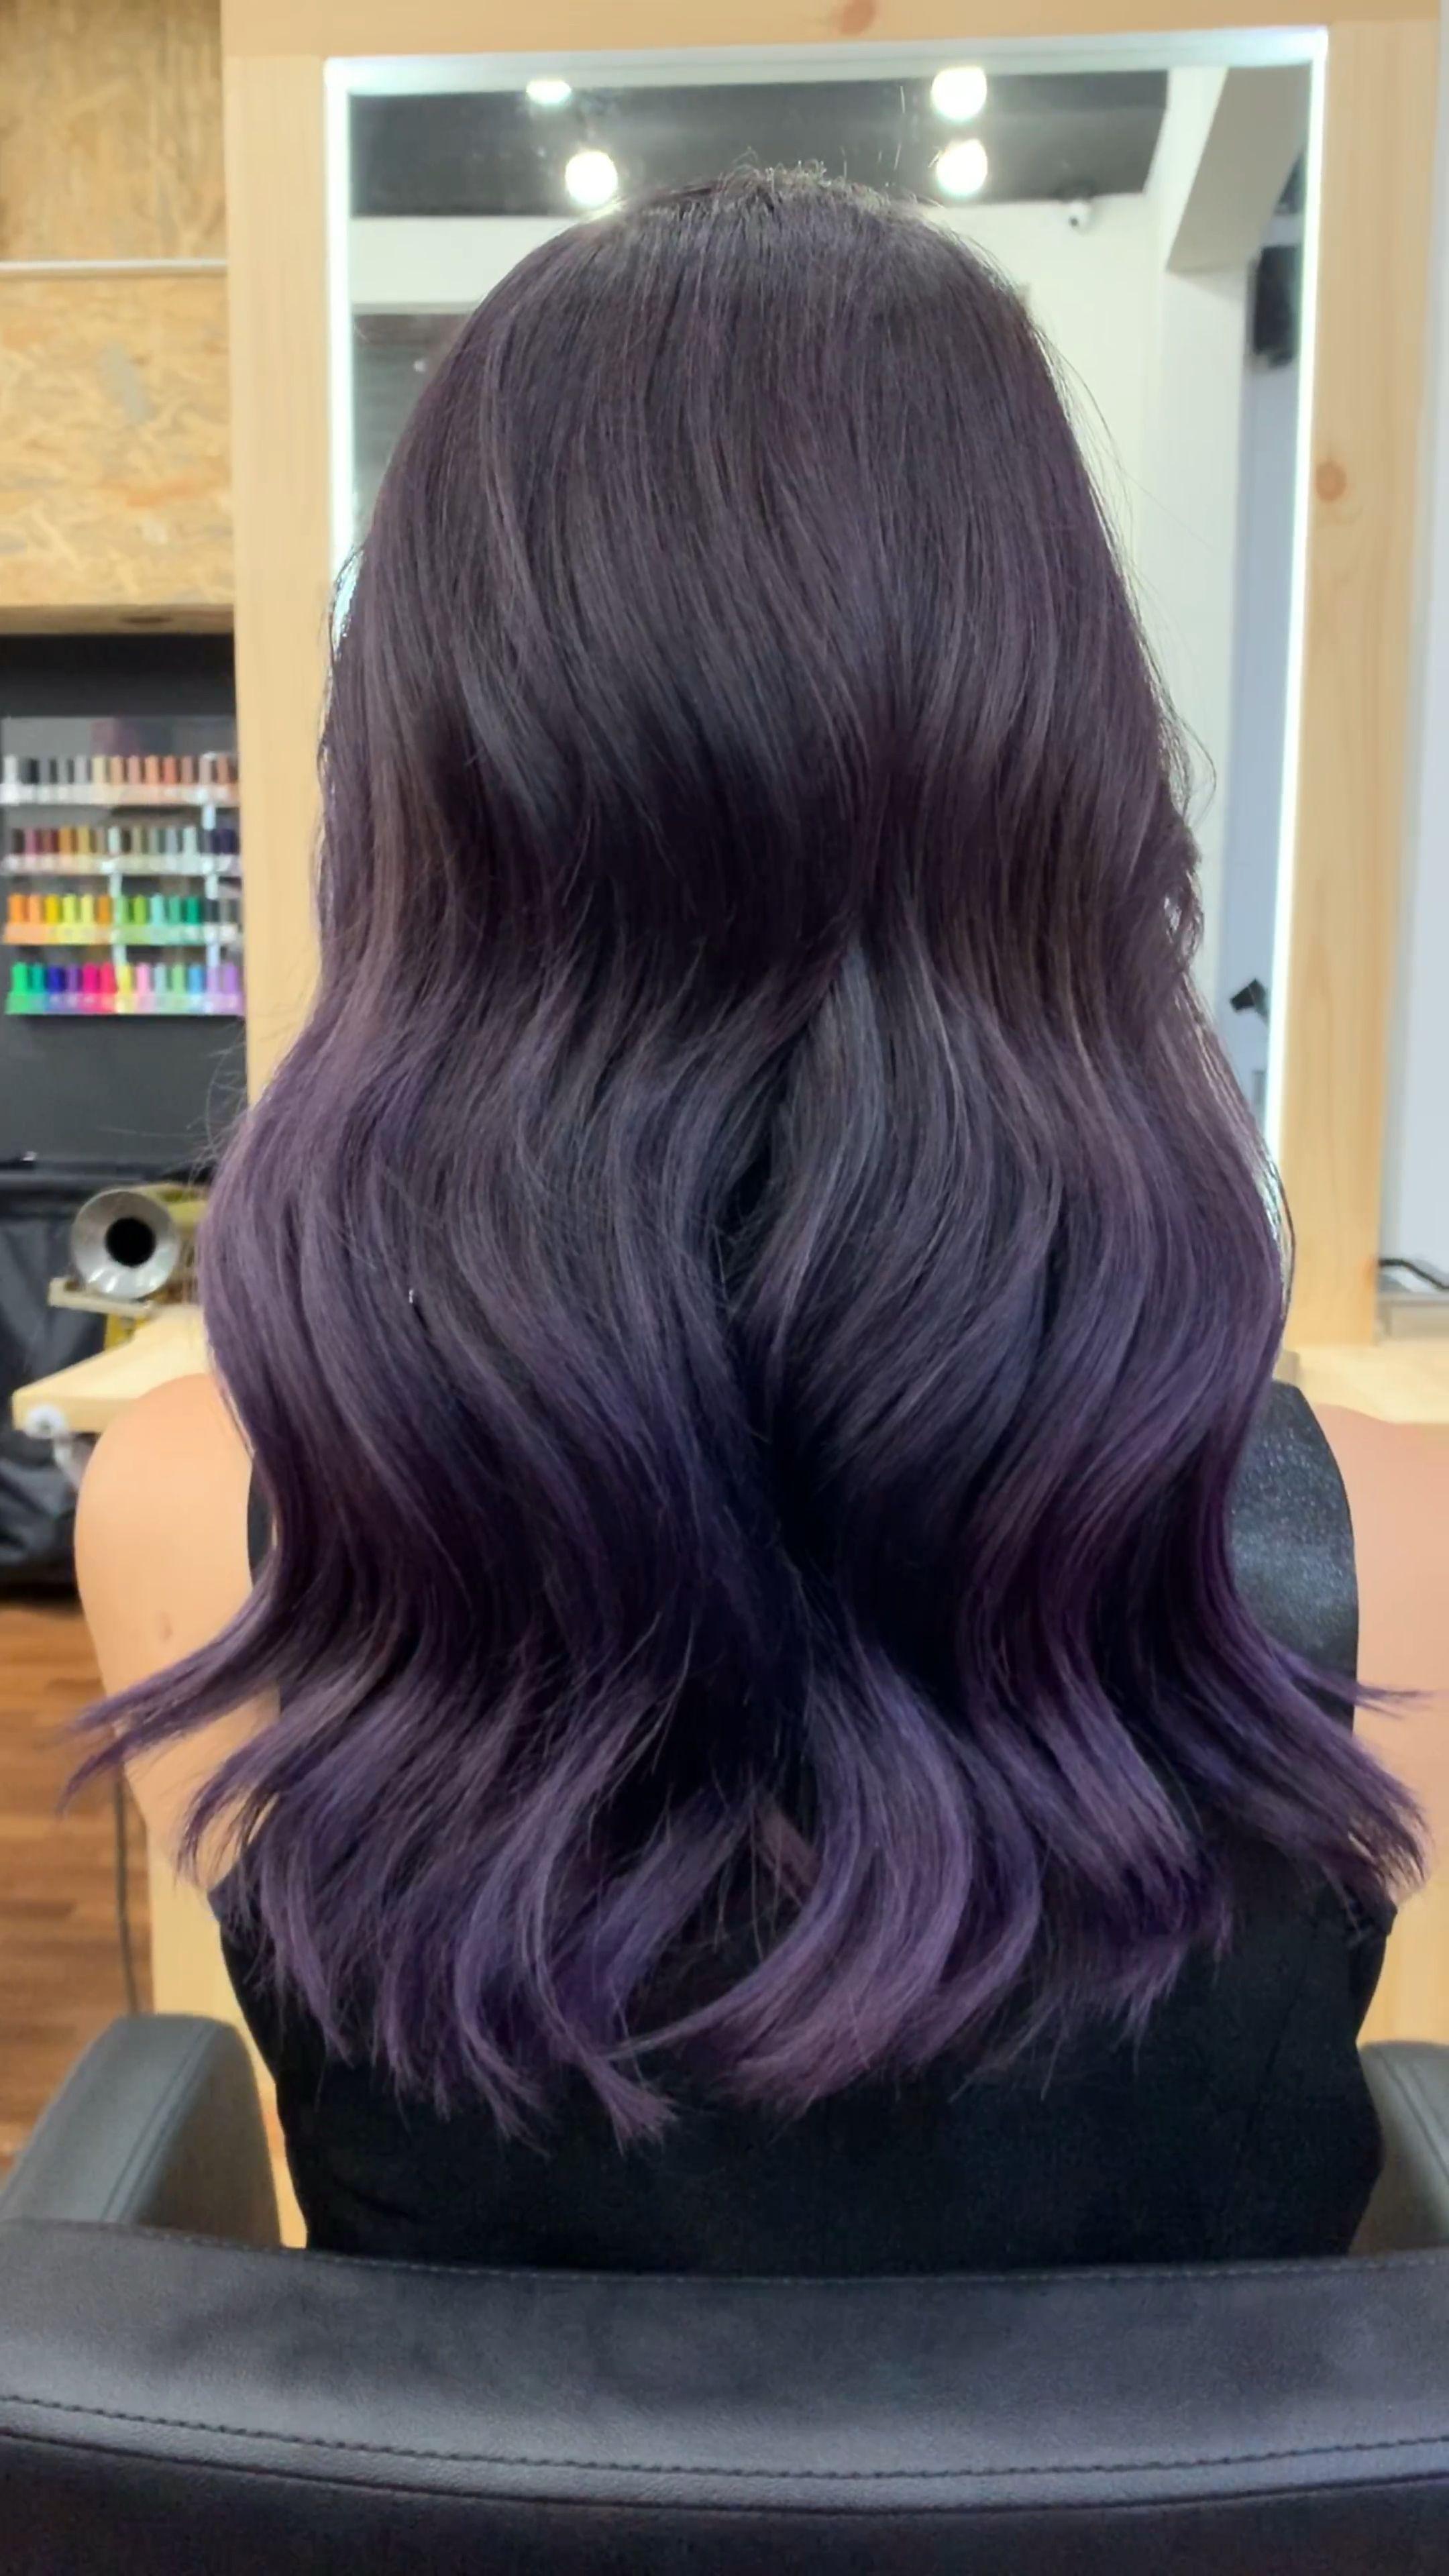 Balayage Hair Purple Subtle Underlights Underlights Hair Black Women Vibrant In 2020 Purple Balayage Underlights Hair Balayage Hair